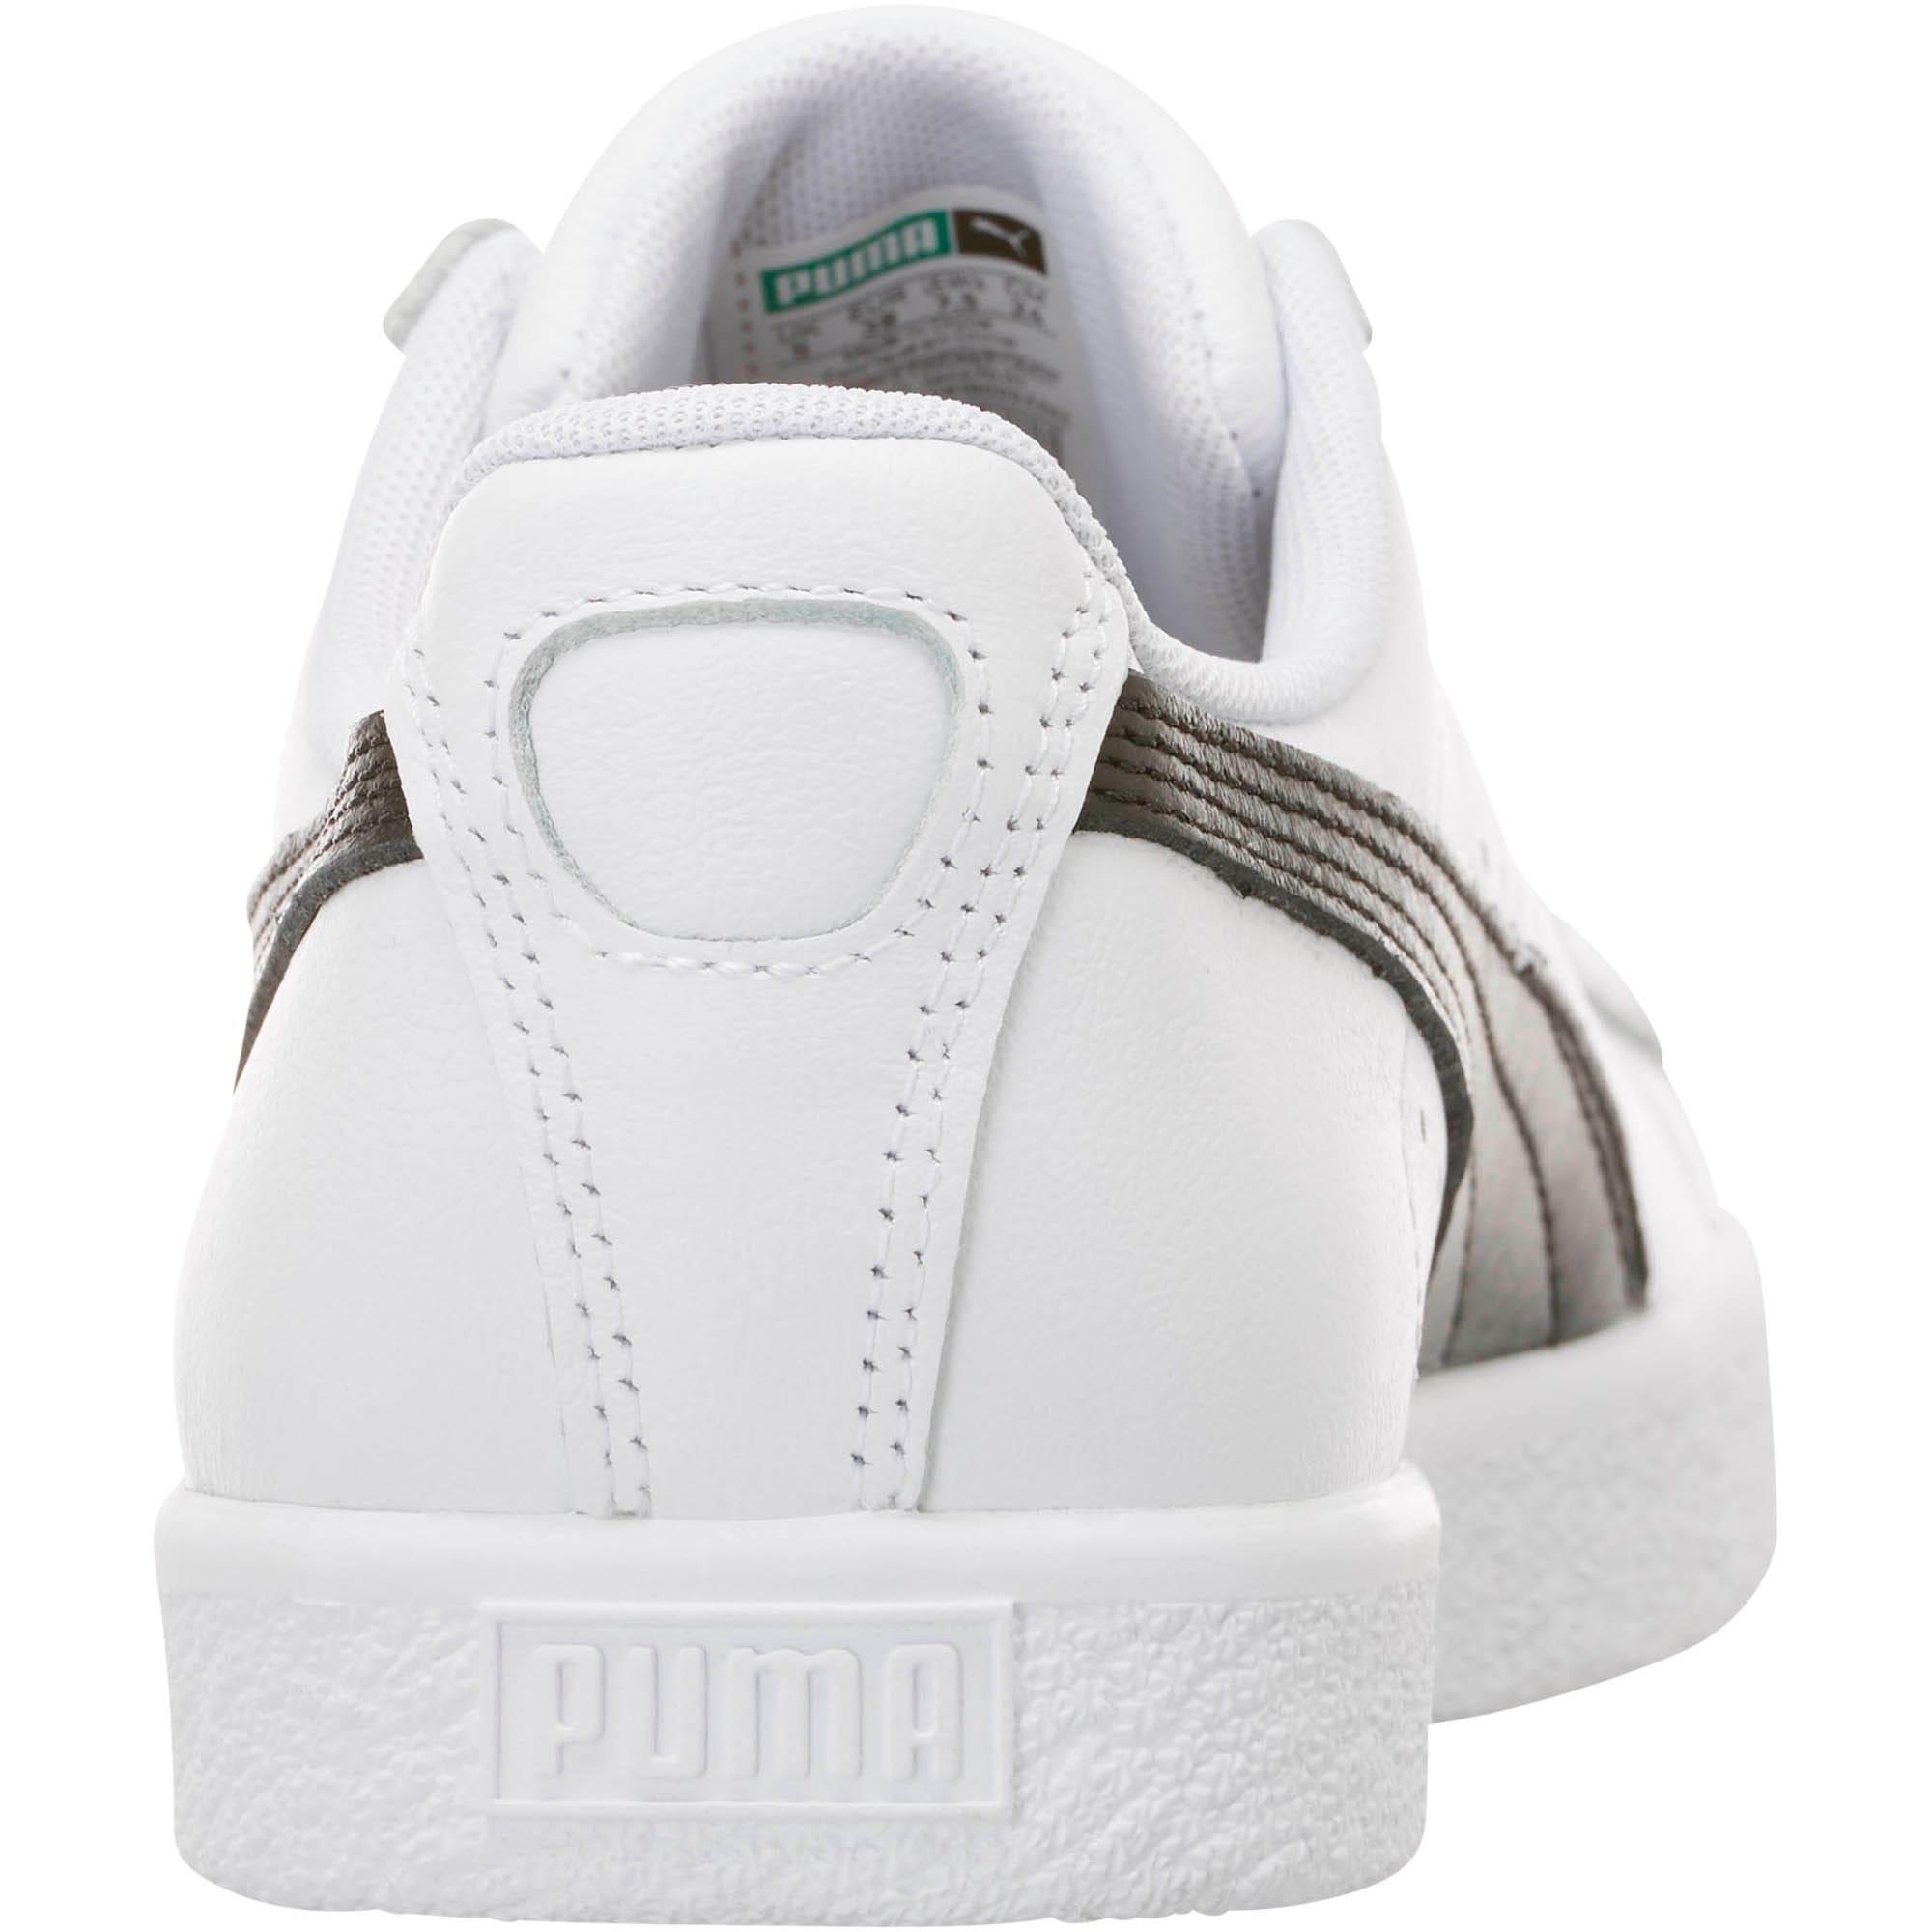 best service 42850 b8e7f Clyde Core Foil Women's Sneakers